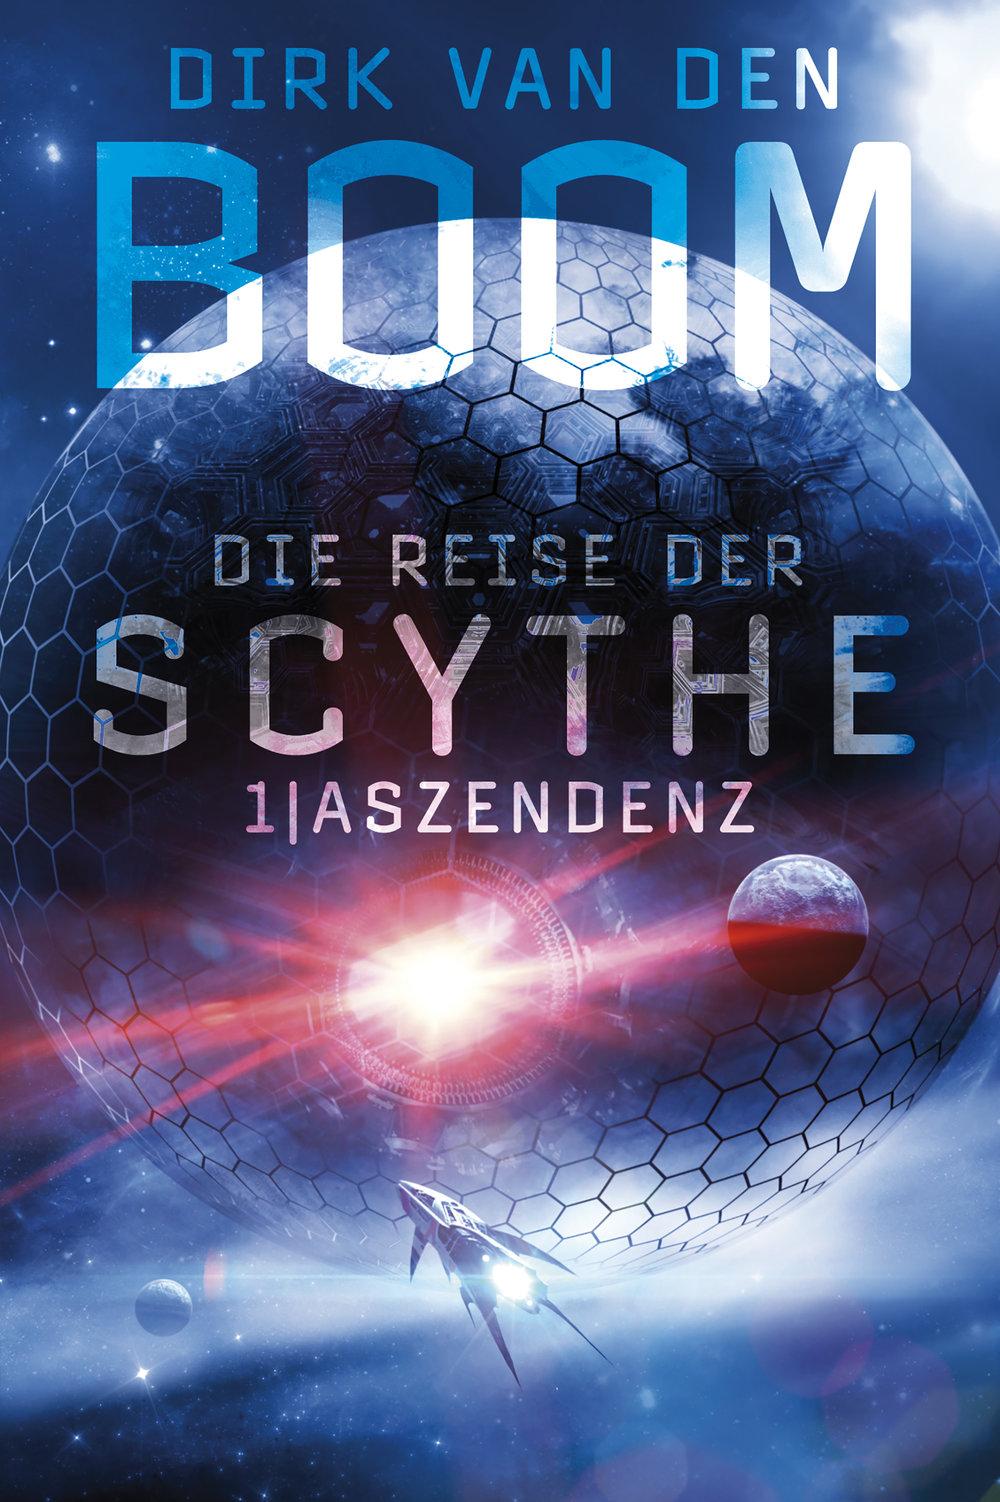 Die-Reise-der-Scythe_Aszendenz_Dirk-van-den-Boom.jpg